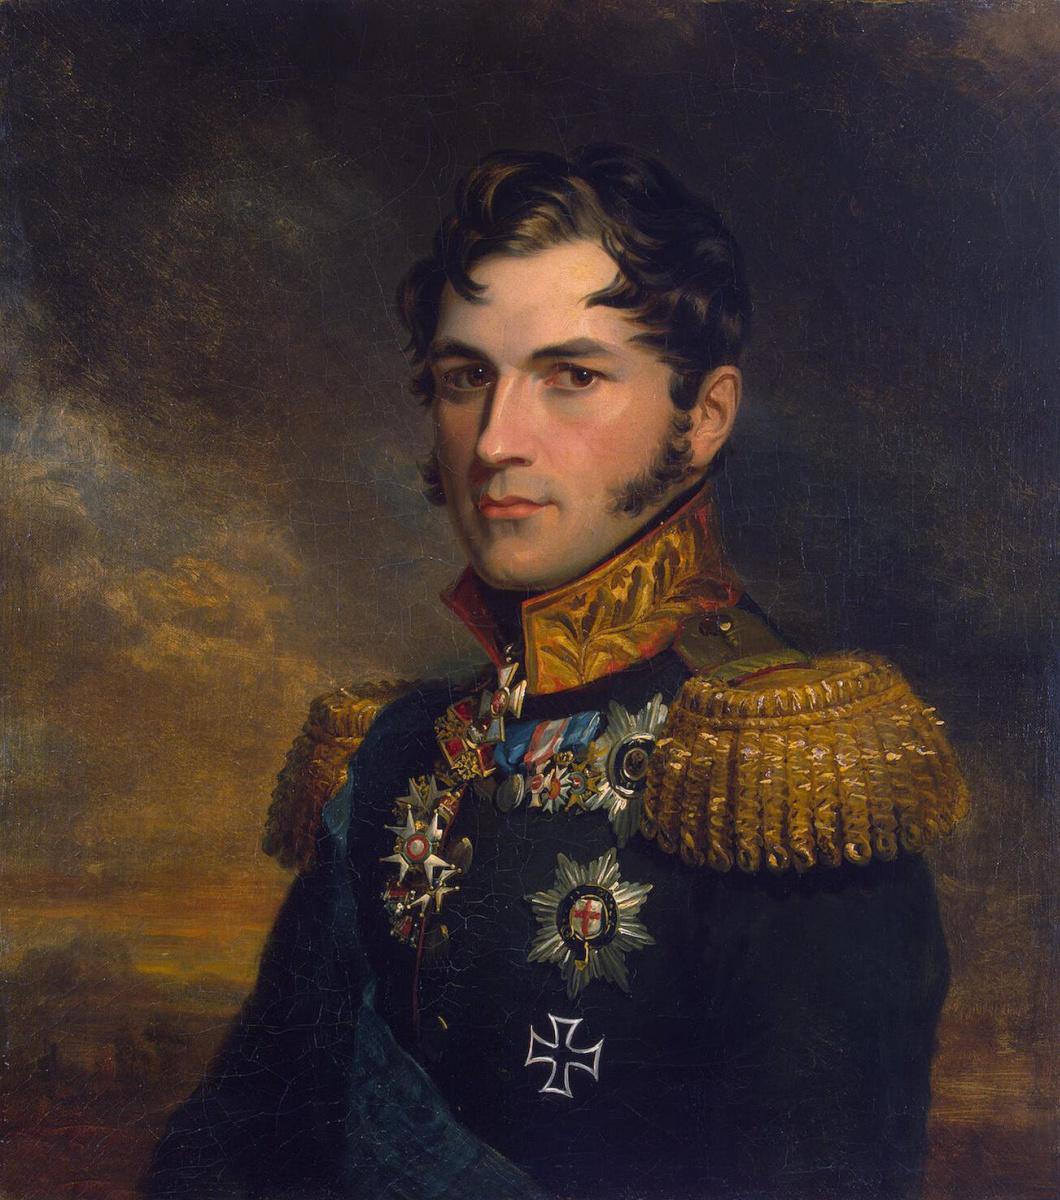 Джордж Доу. Портрет принца Леопольда Саксен-Кобургского